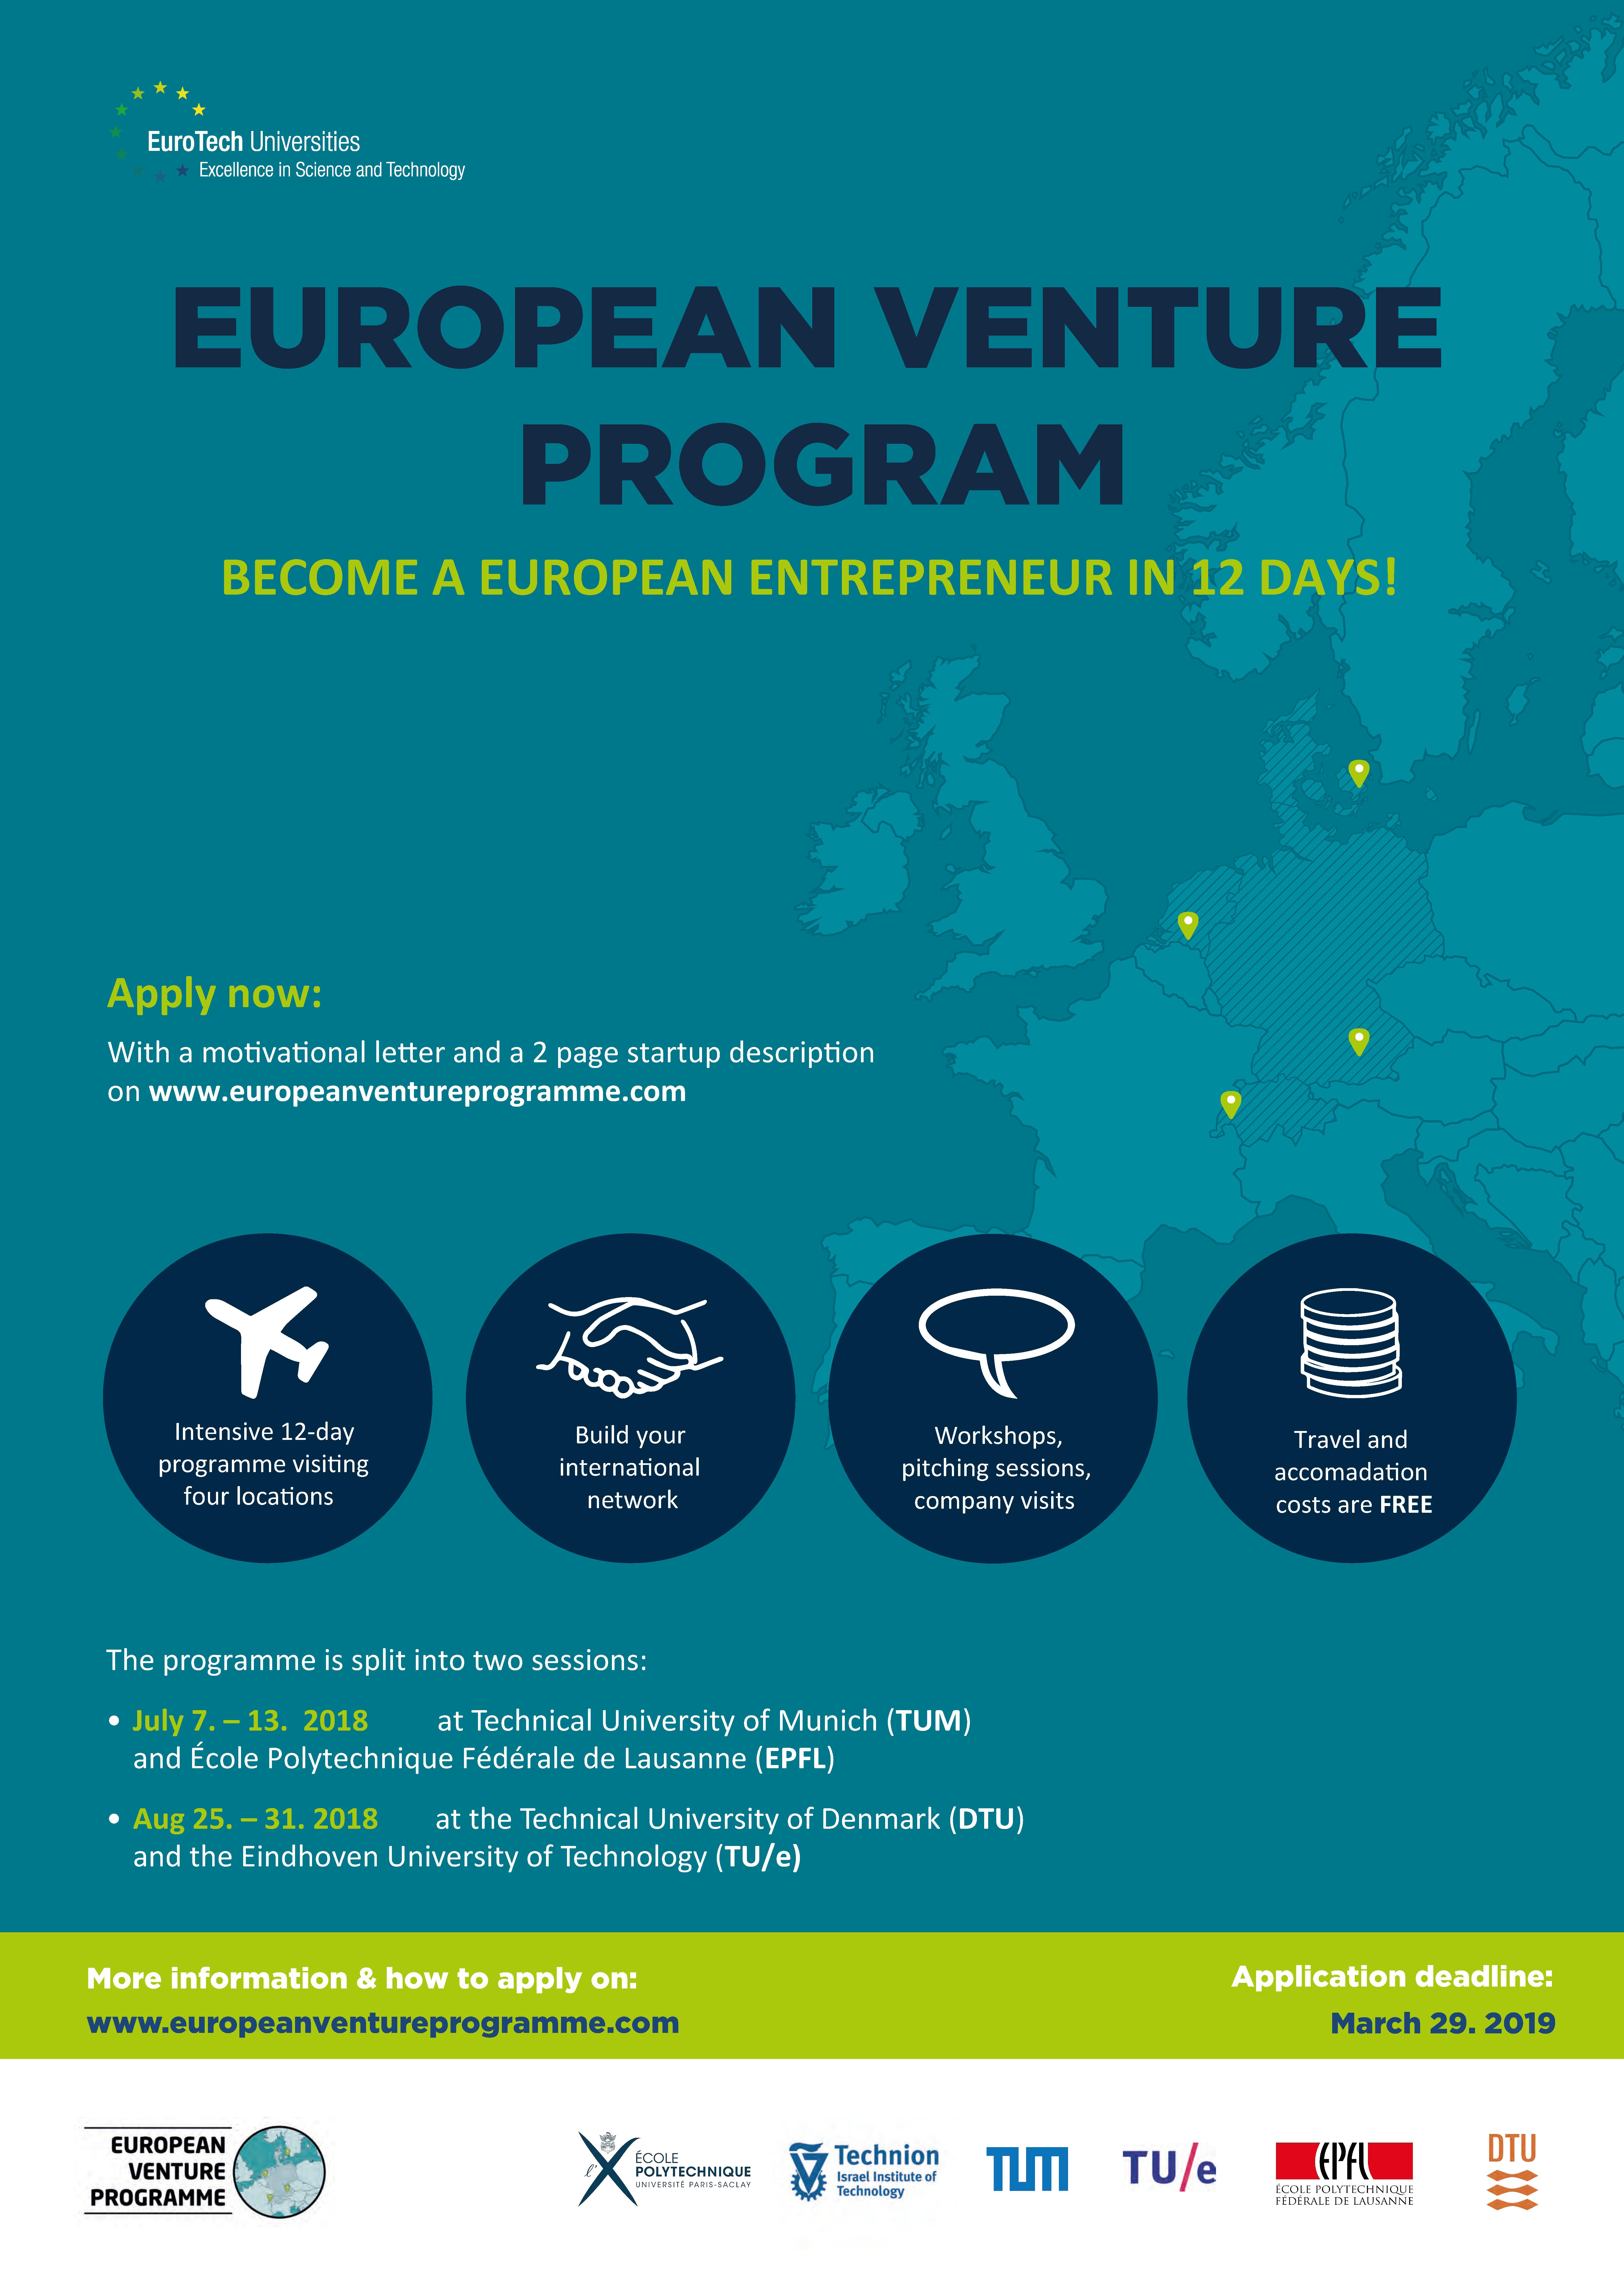 EVP poster 2019_KB2 (002) - Eurotech Universities